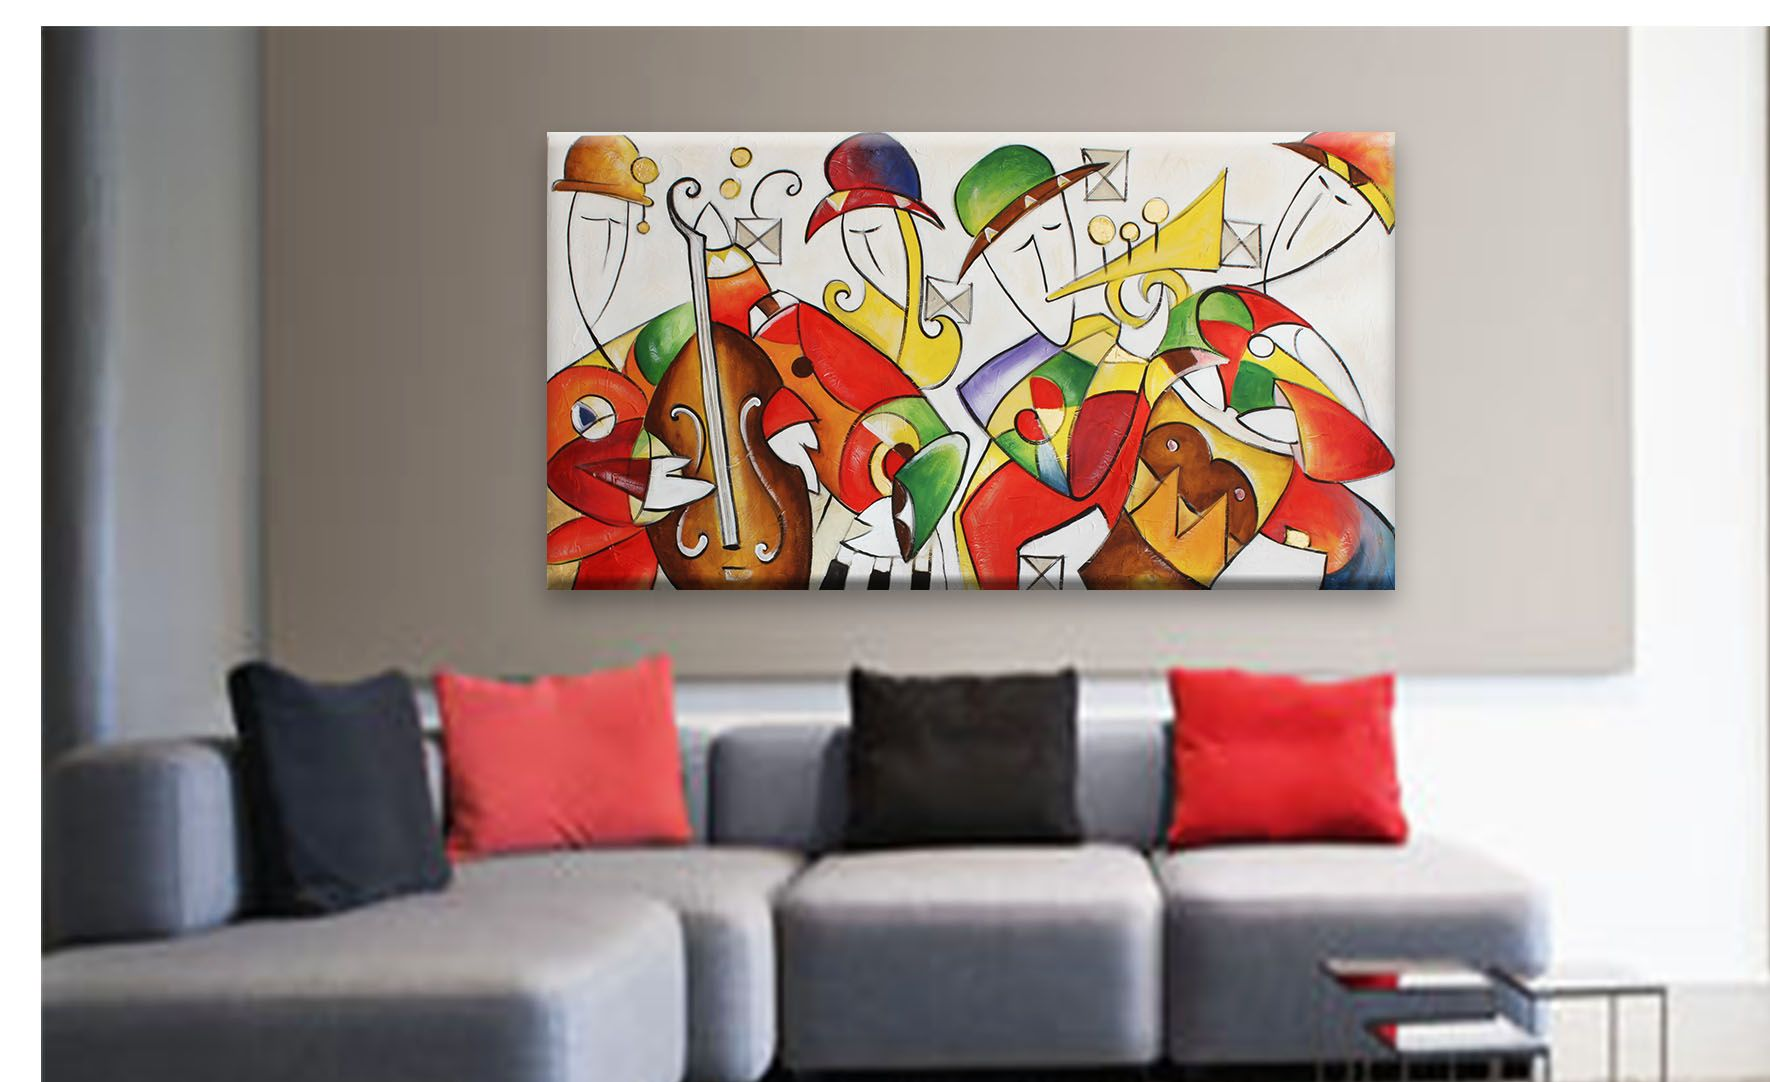 Quadri astratti moderni quadri dipinti moderni colorati for Quadri moderni astratti dipinti a mano